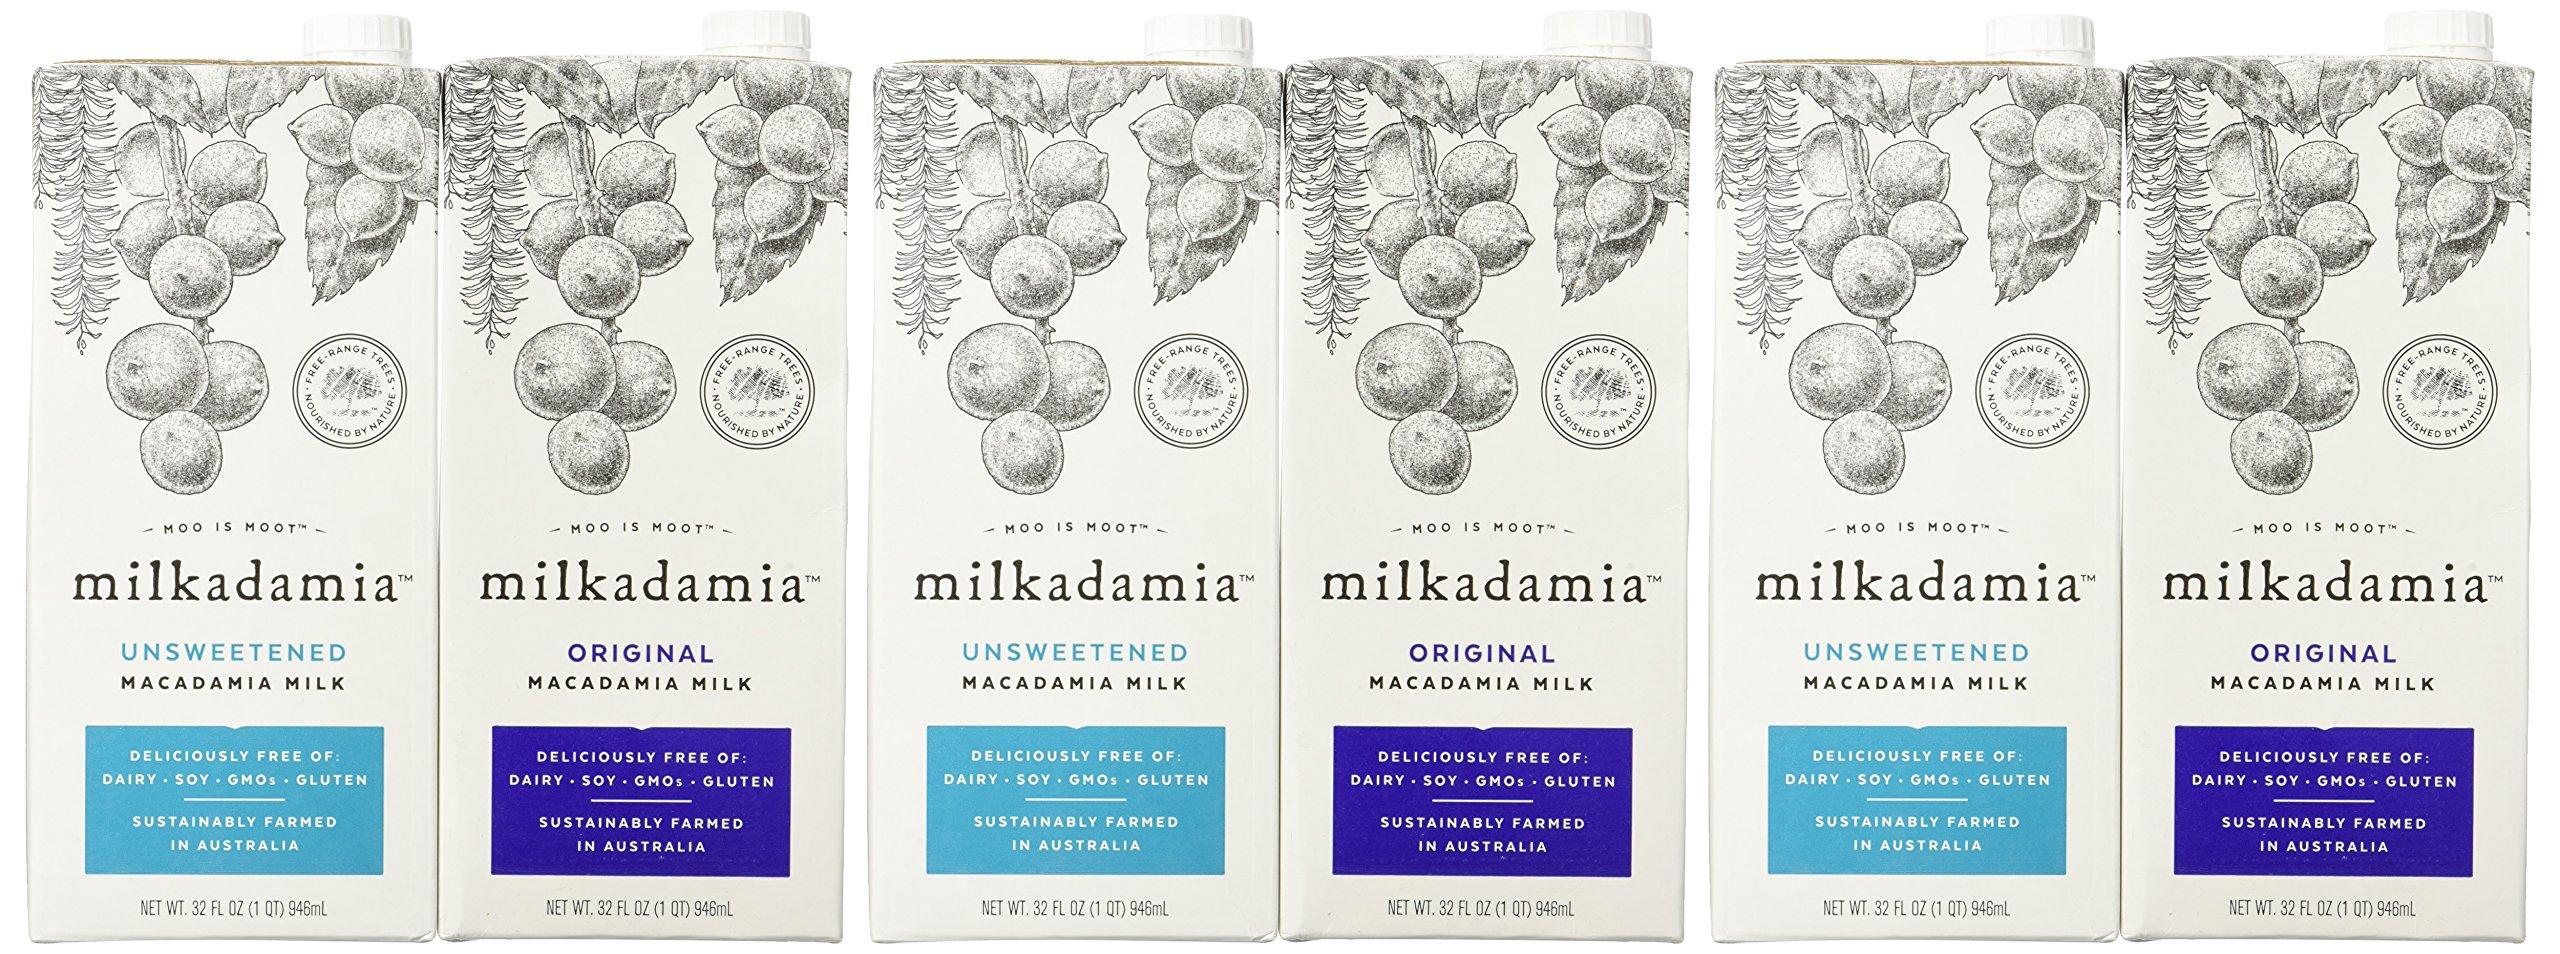 Milkadamia Variety Pack, Macadamia Milk, 32 Ounce  (Pack of 6) by Milkadamia (Image #1)